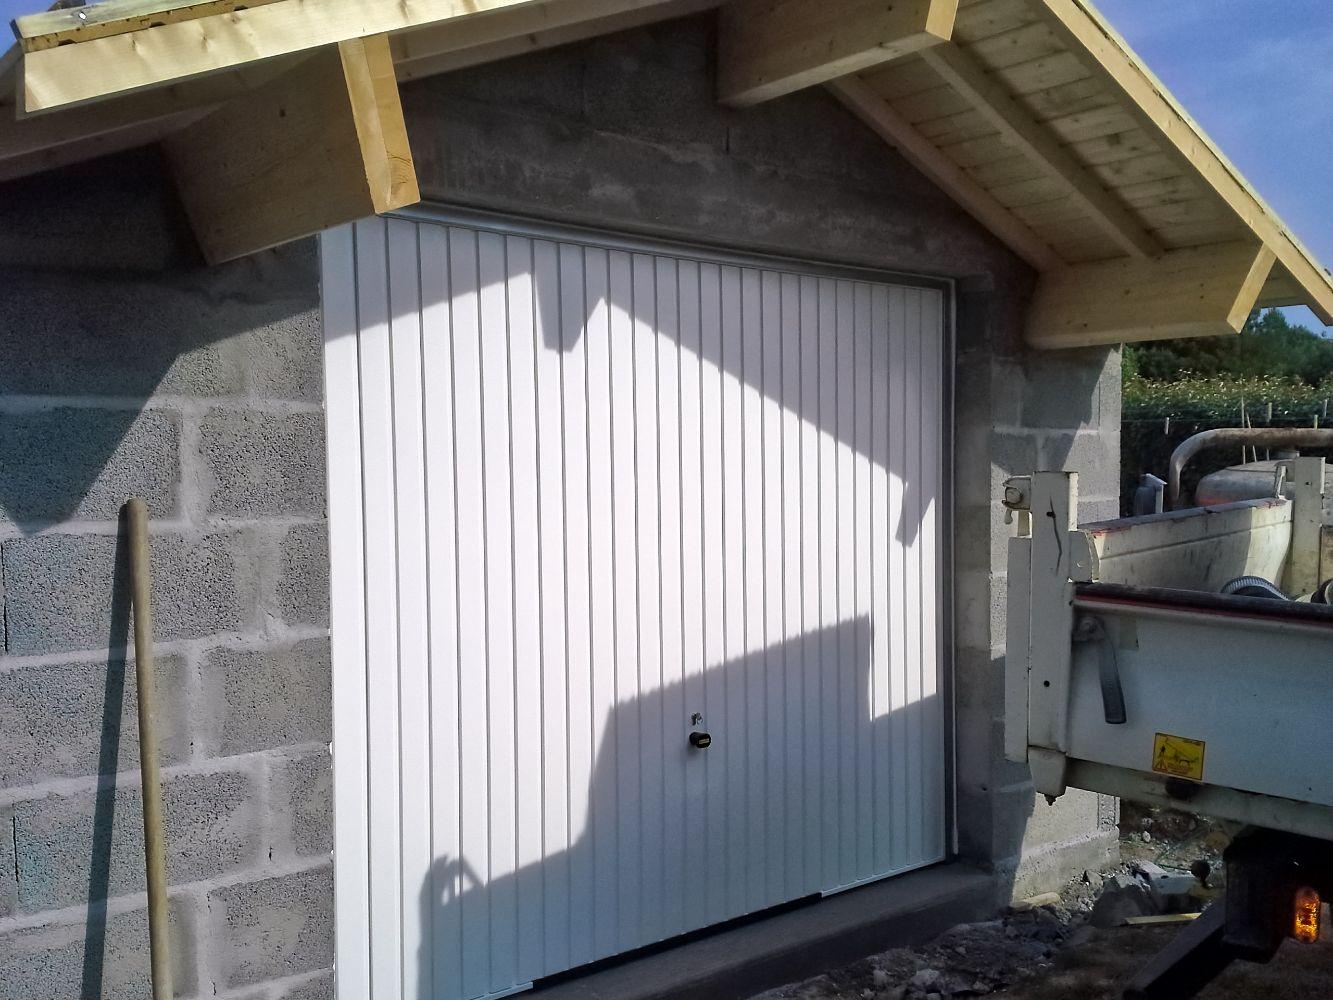 Cr pin menuisier charpentier serrurier r alisations st p re en retz - Garage charpentier nantes ...